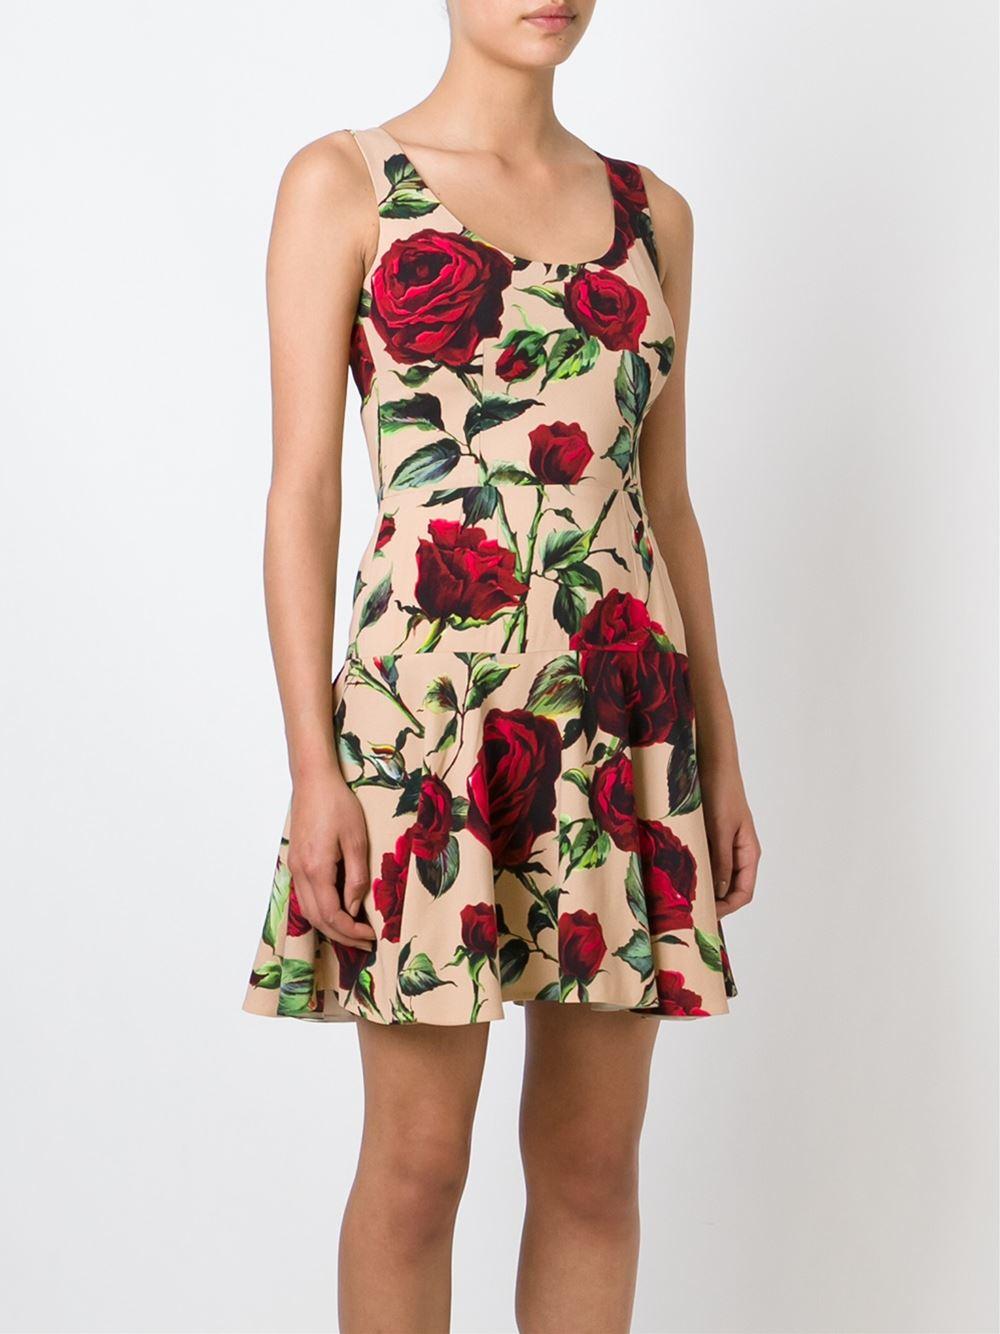 Dolce & gabbana Rose Print Dress in Red (rose) | Lyst